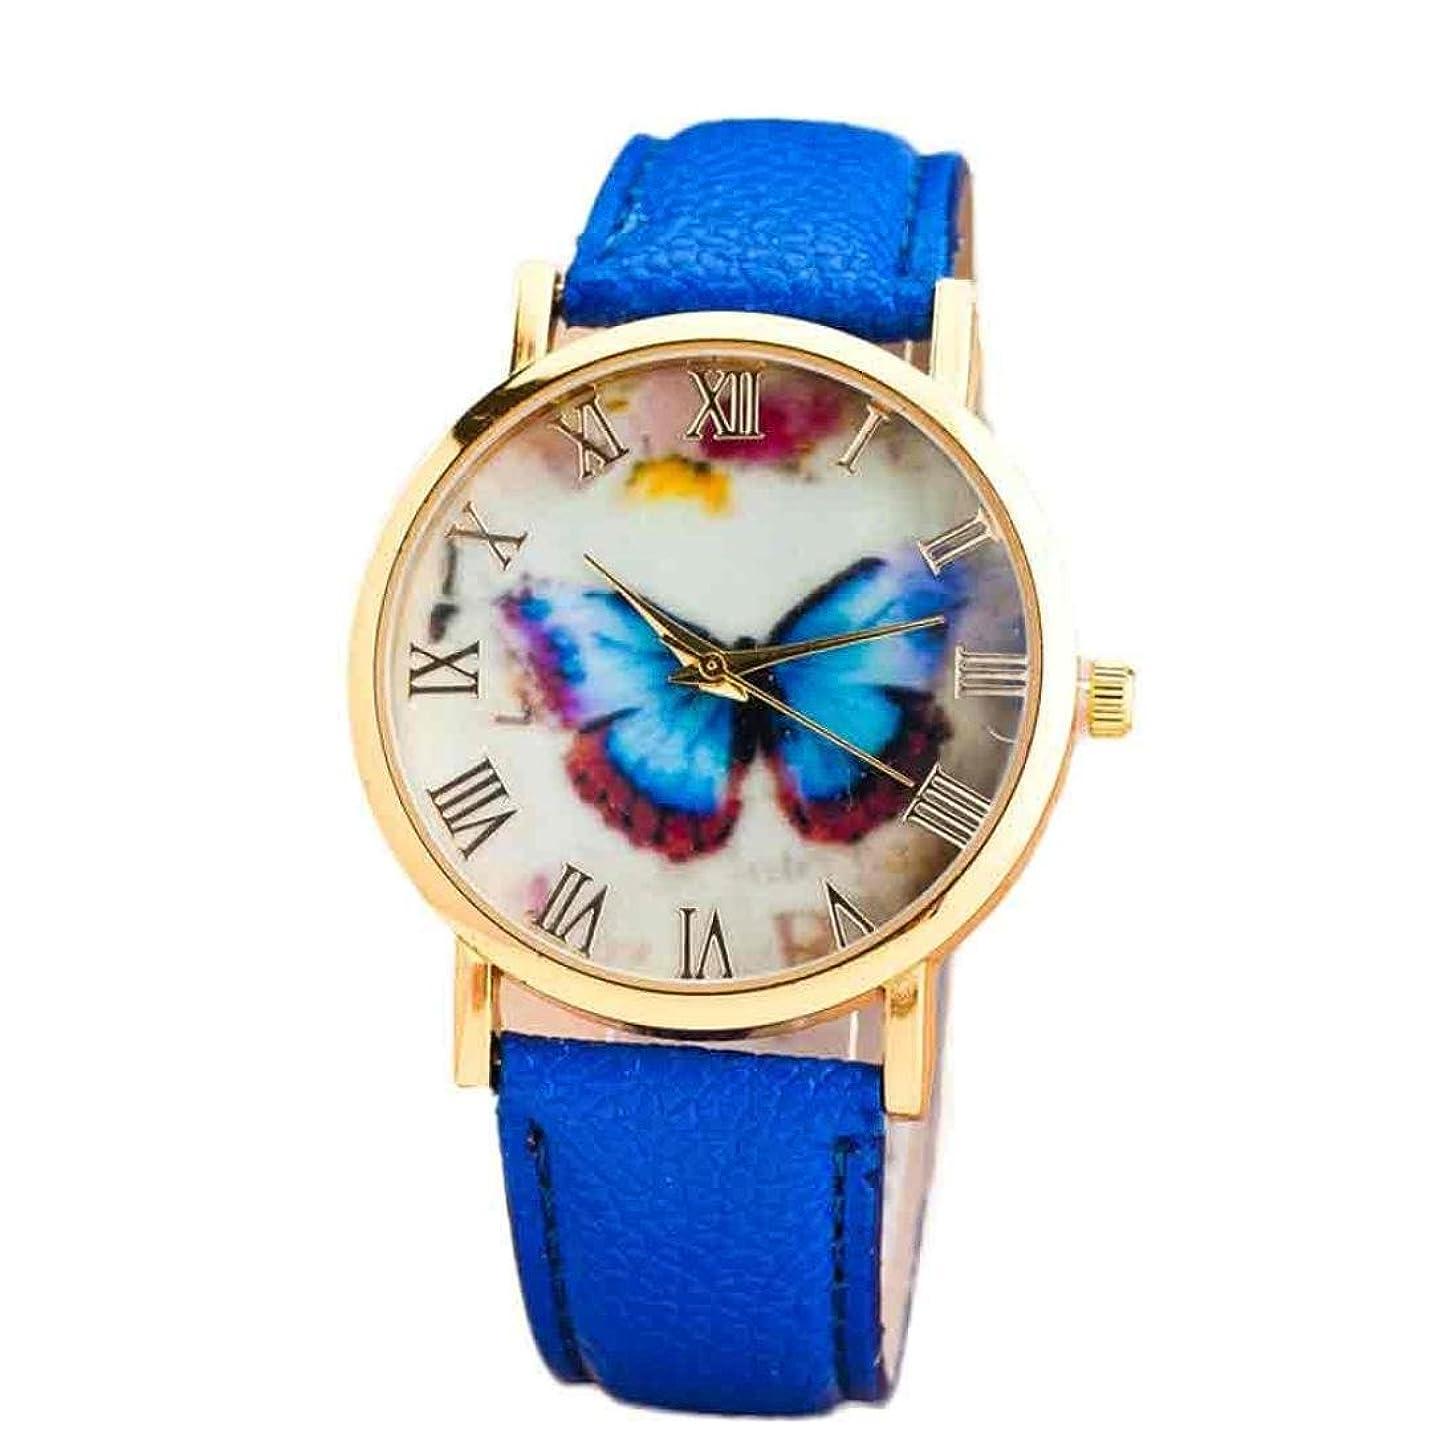 Women Girls Analog Quartz Watches with Leather Band Cuekondy Fashion Butterfly Style Business Dress Wrist Watch Bracelet (Blue)